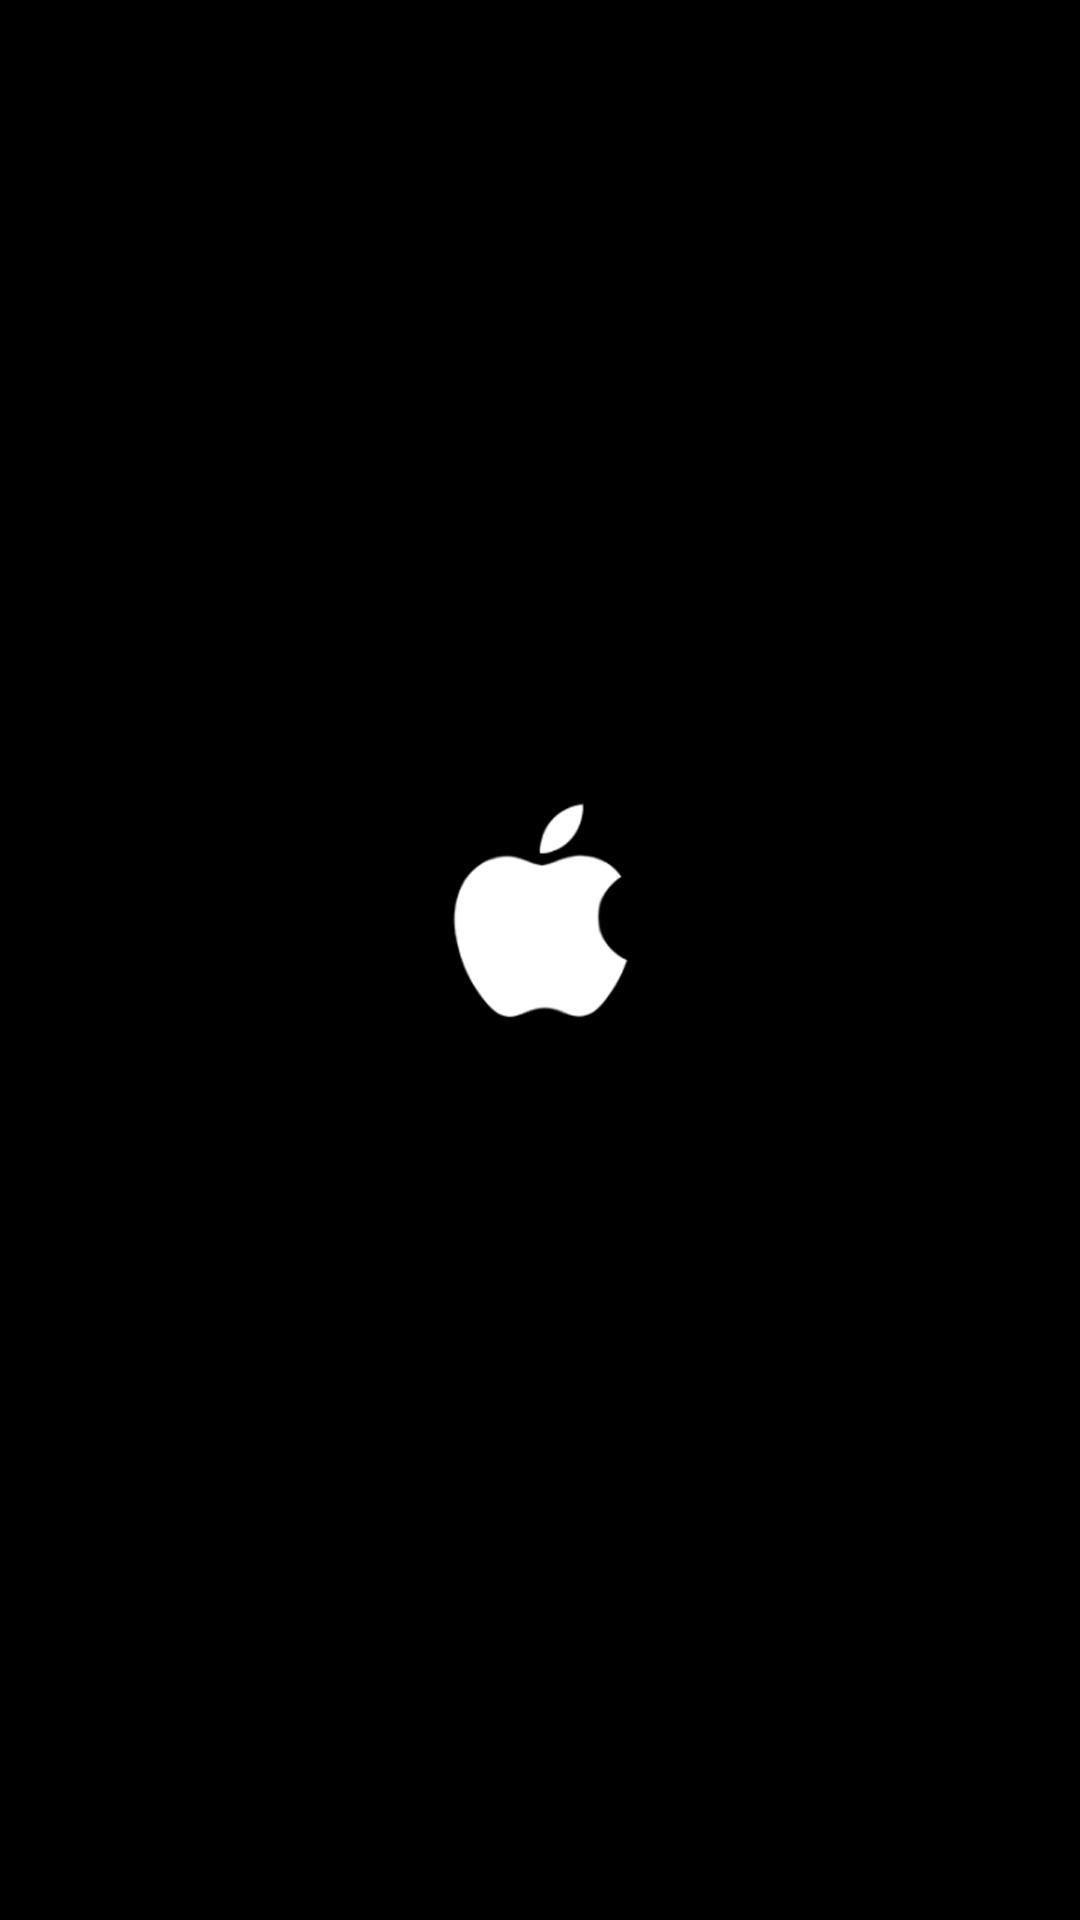 champagne gold apple logo | iphone wallpaper | iphone | pinterest